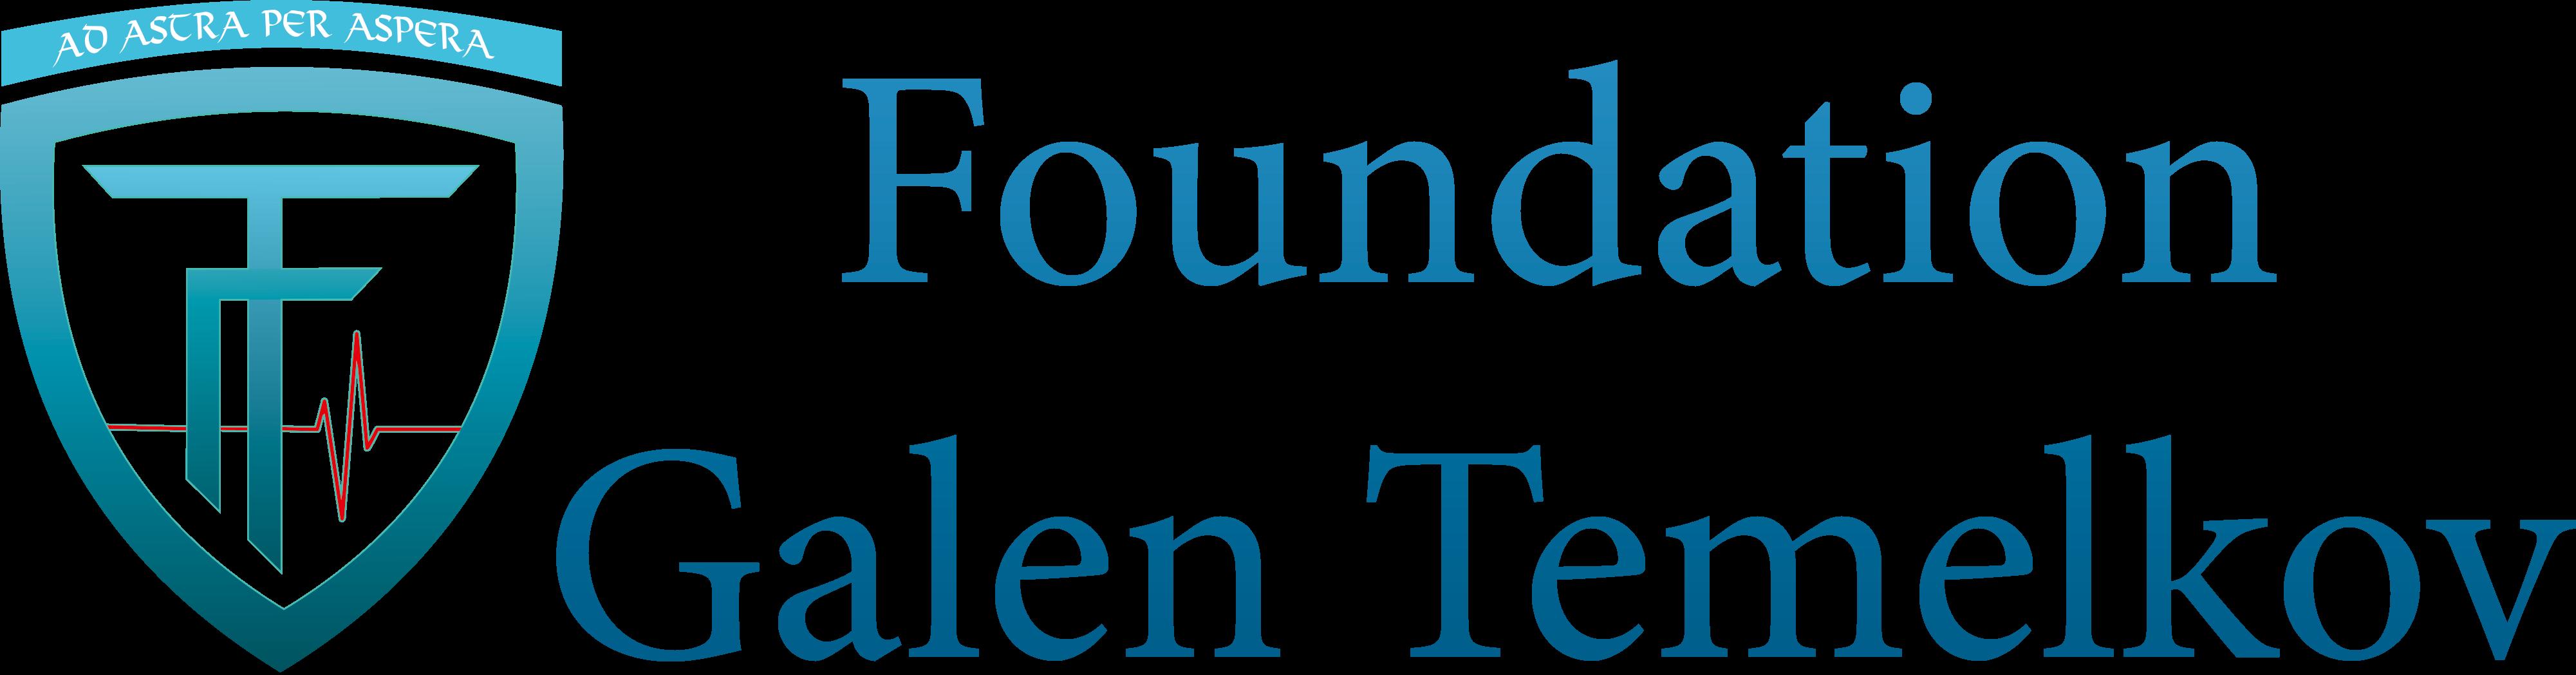 Foundation-Galen-Temelkov